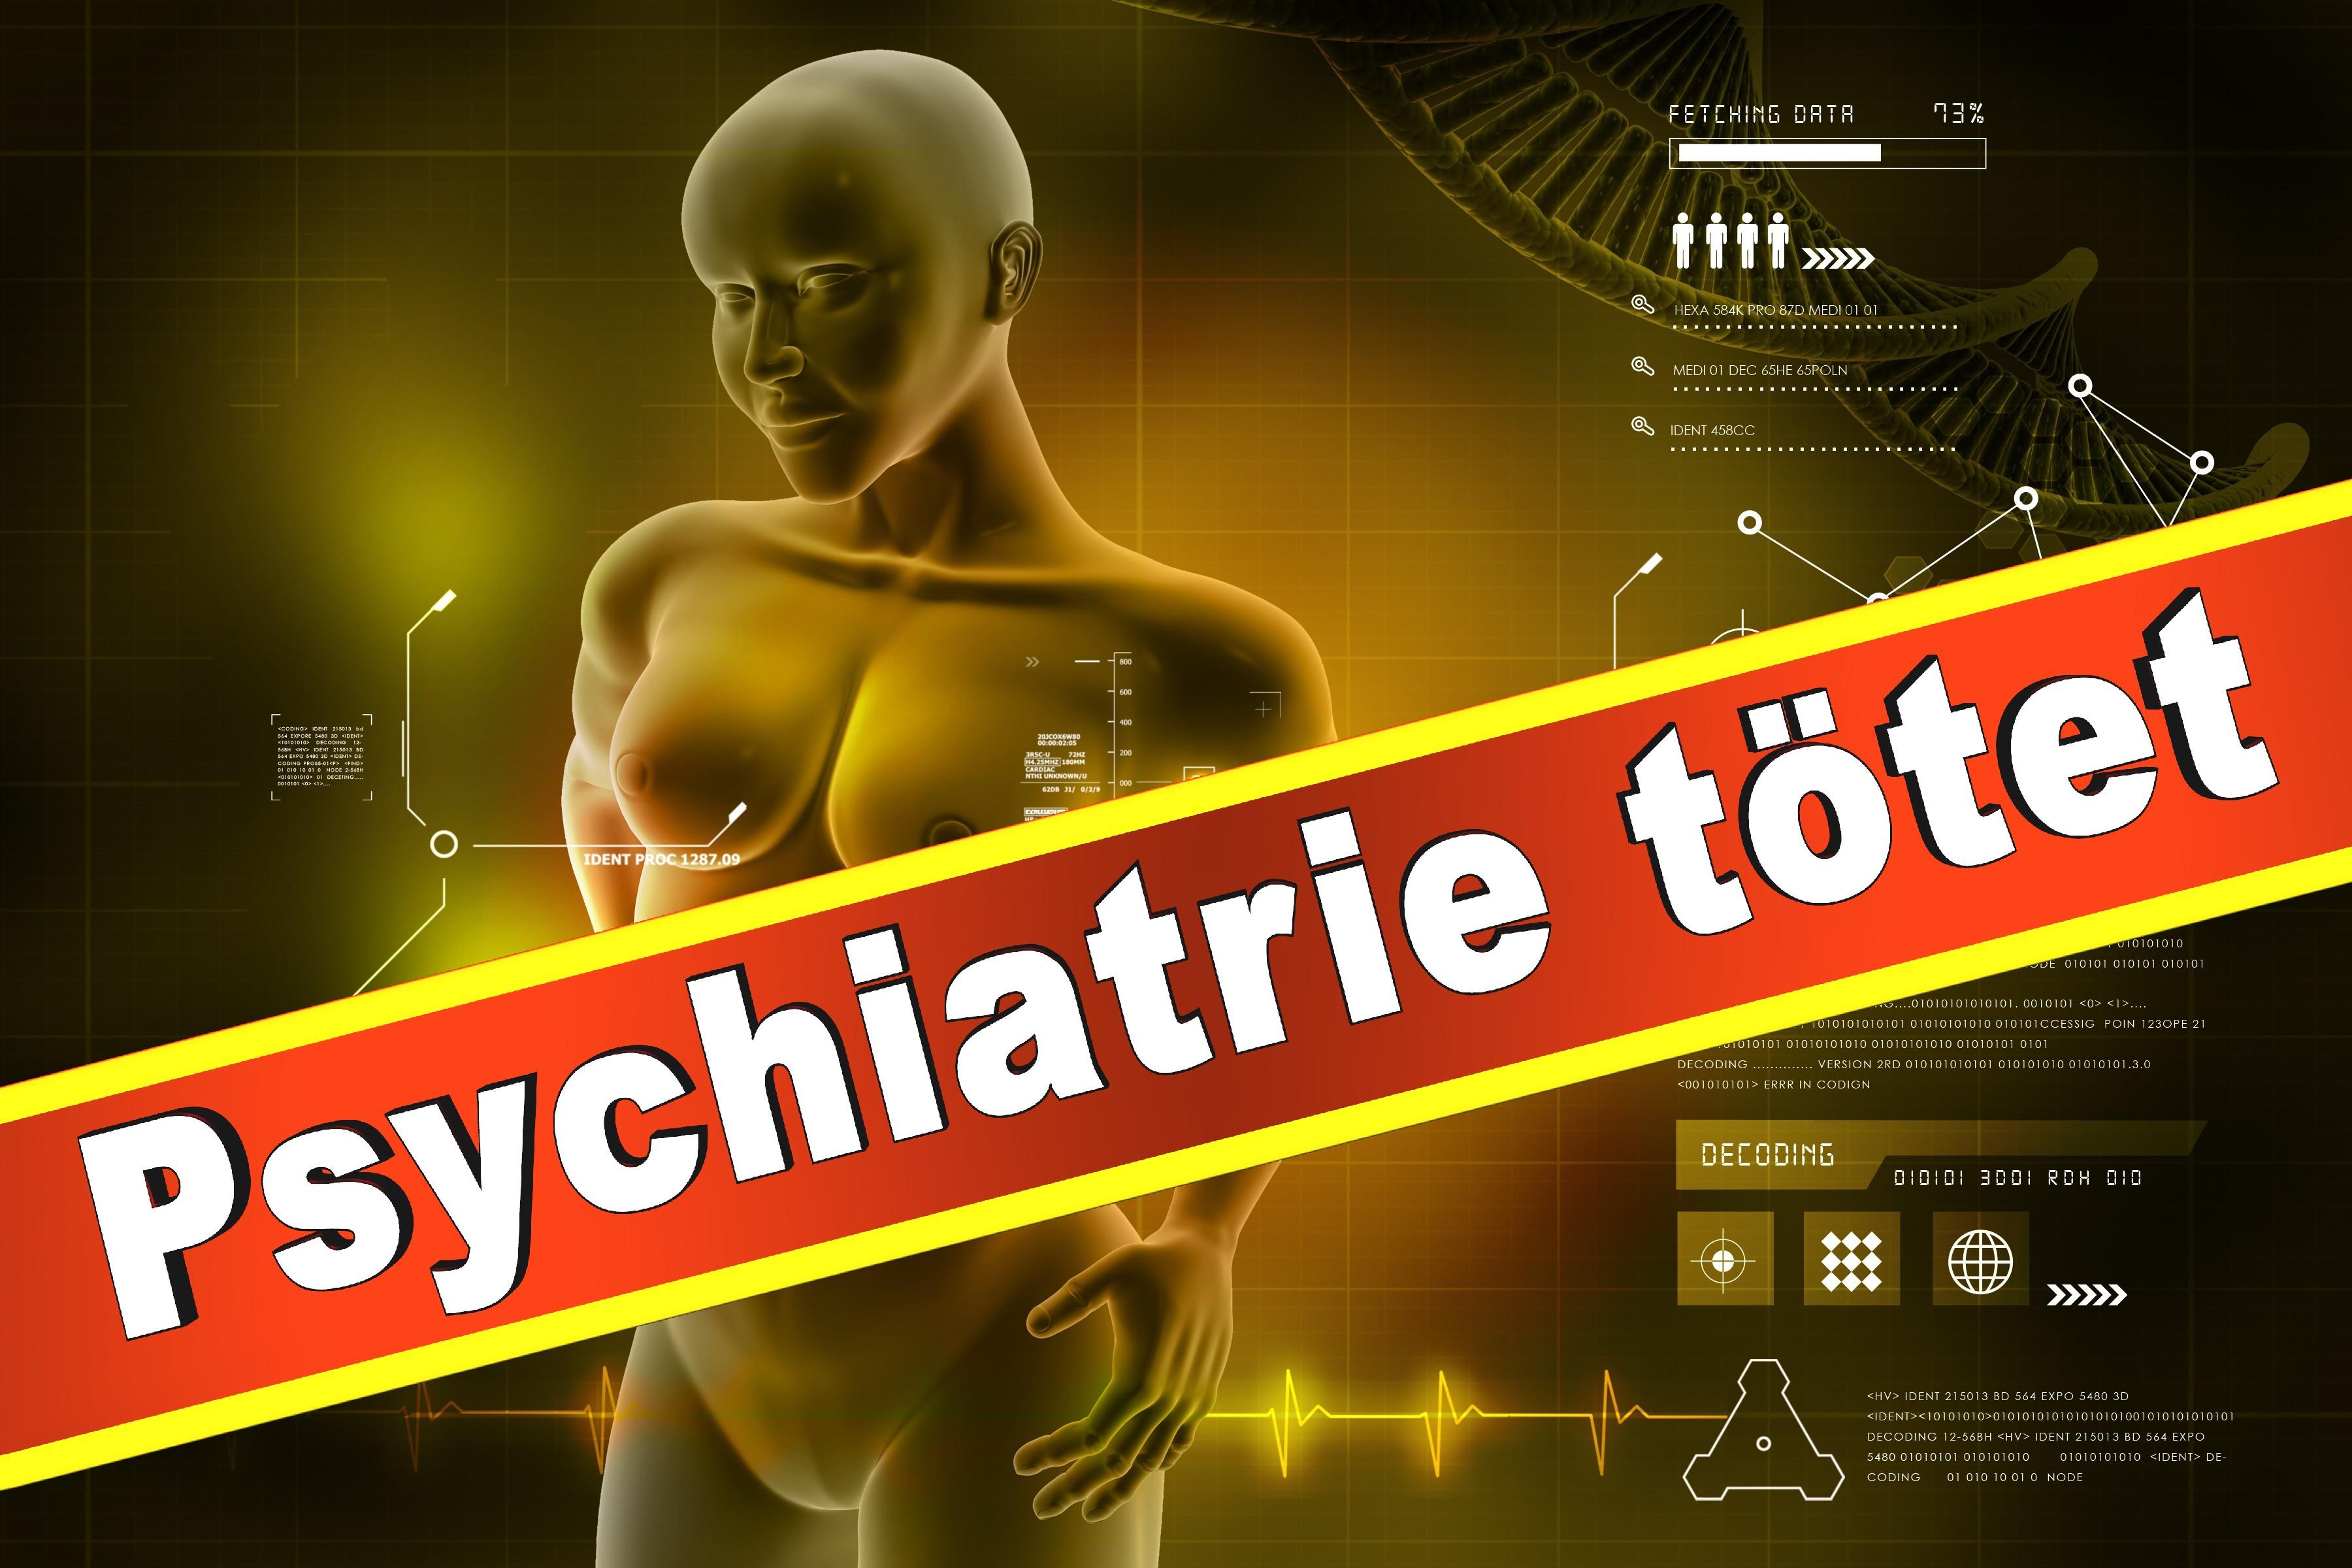 Herr Dr Med Jan Bierlink Psychotherapeut Hannover Gutachten Psychiater Facharzt Psychiatrie